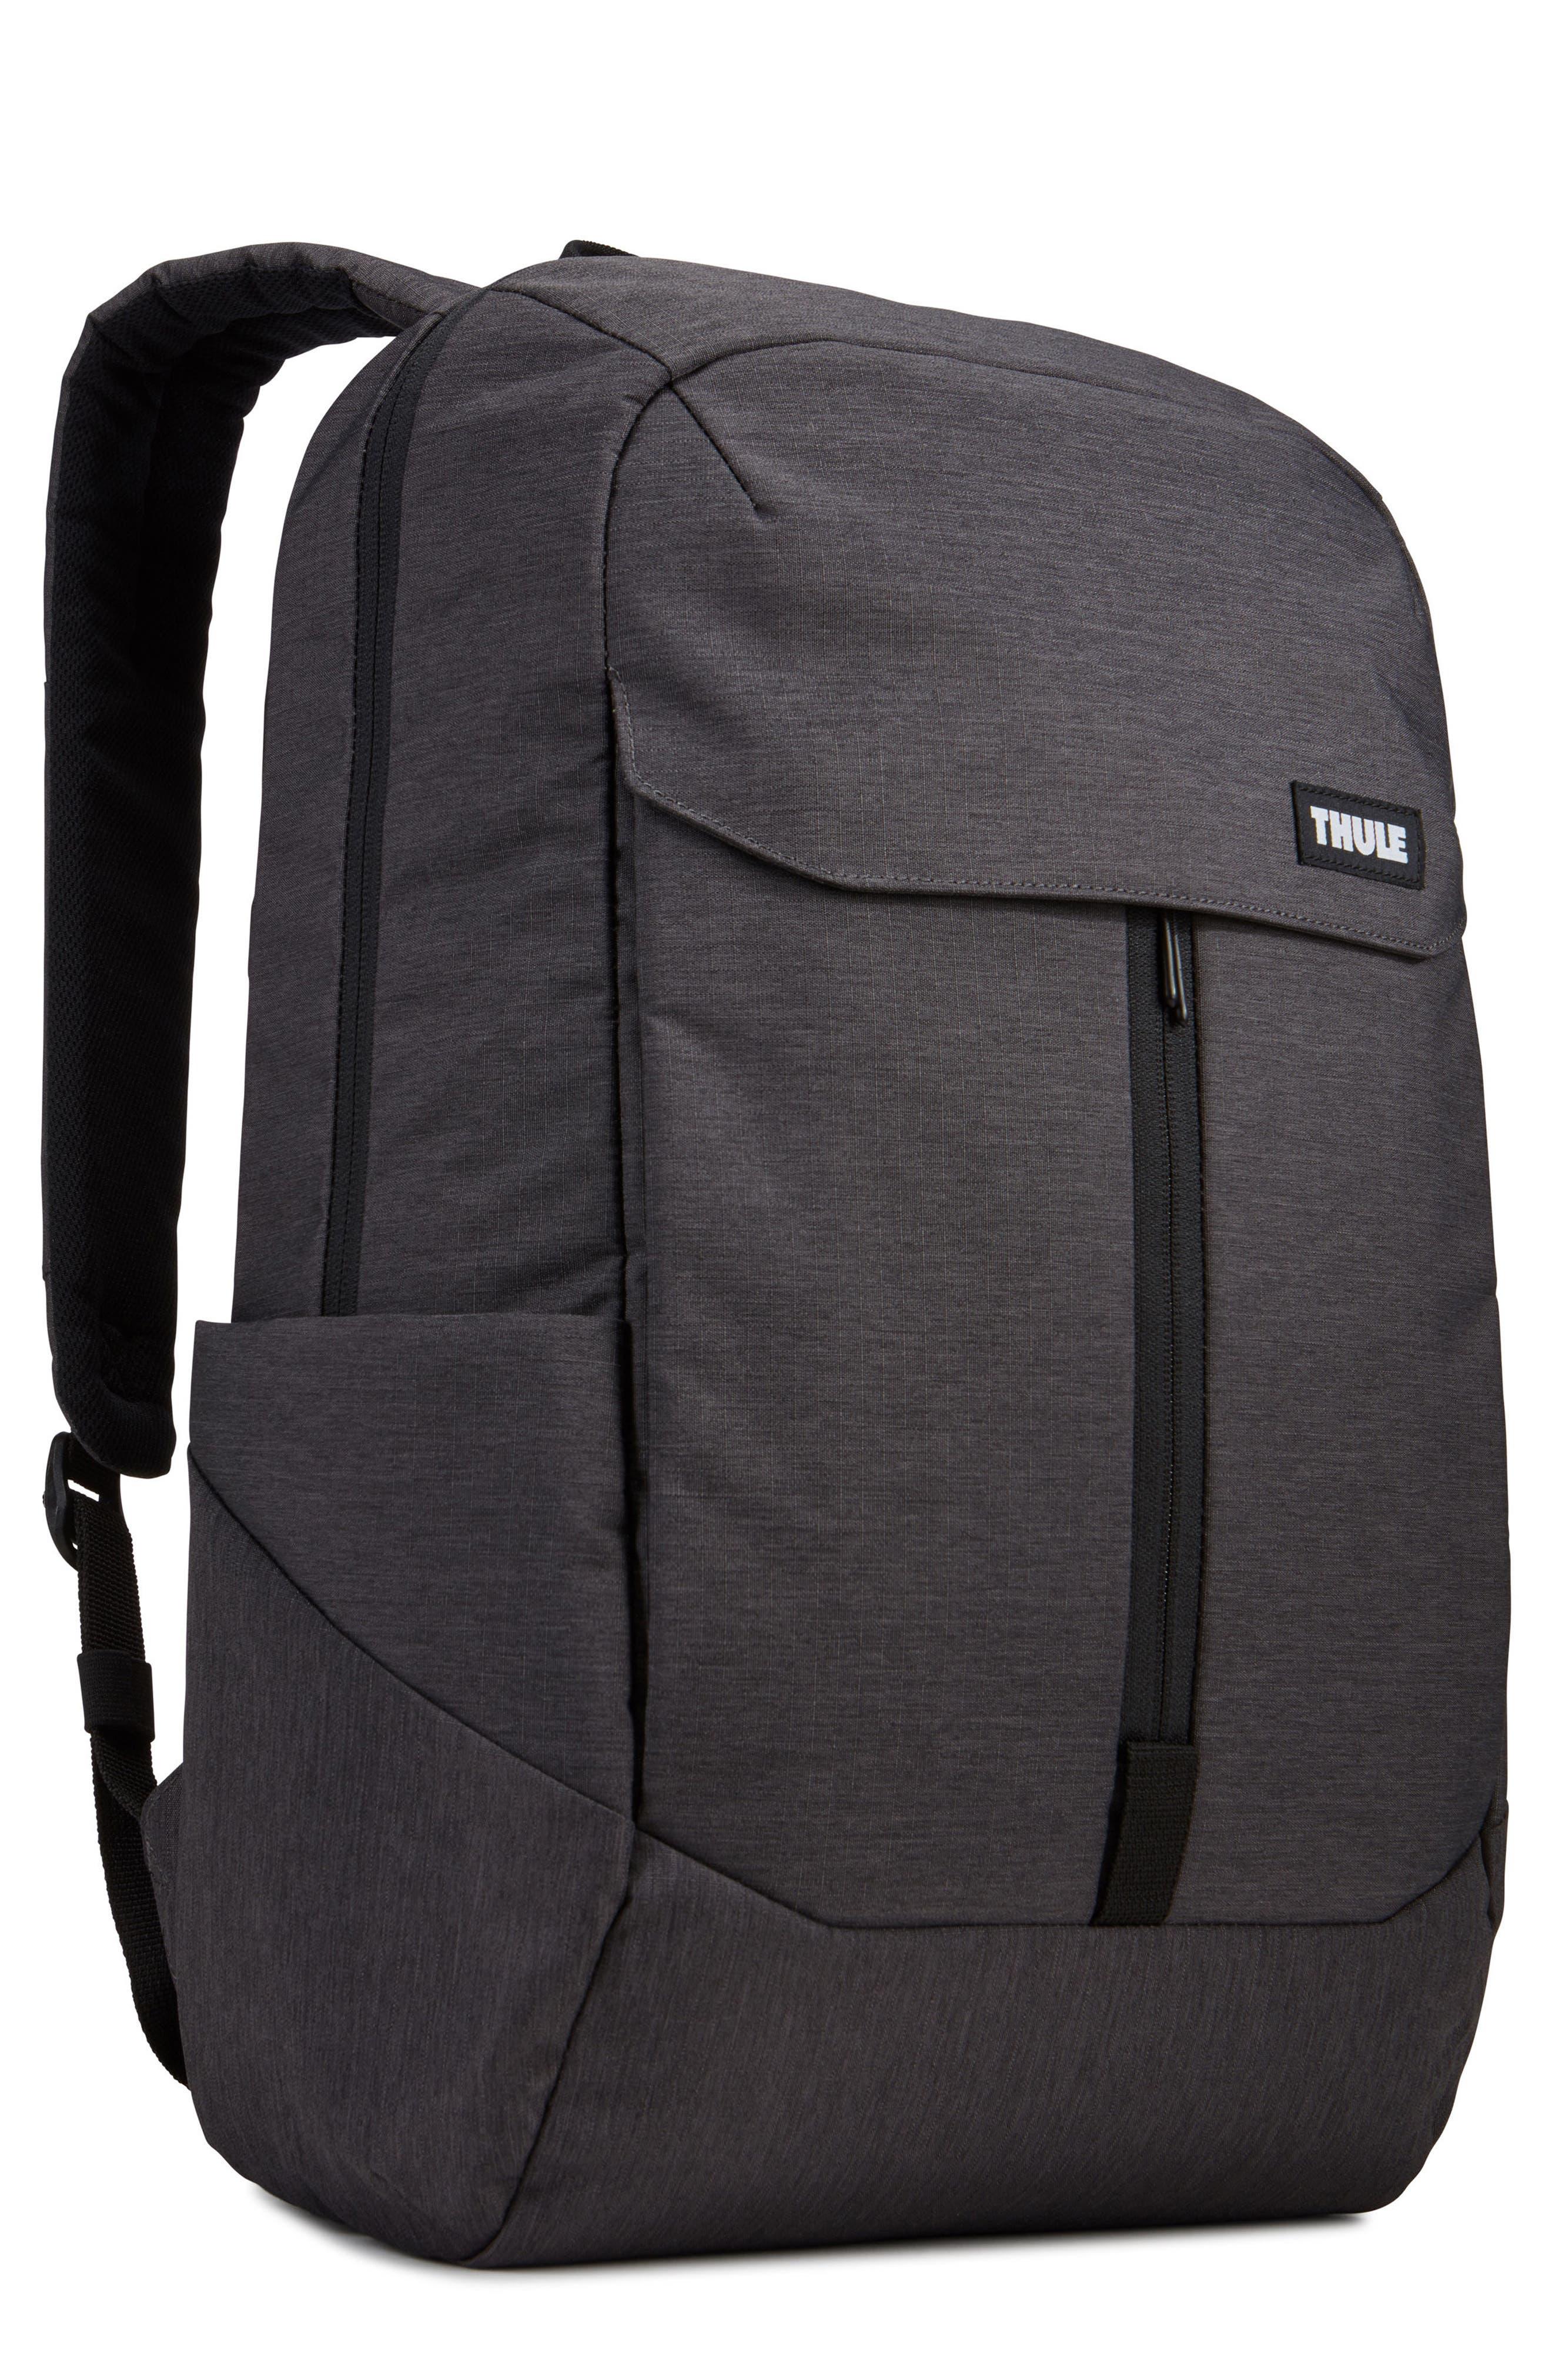 Thule Lithos Backpack -